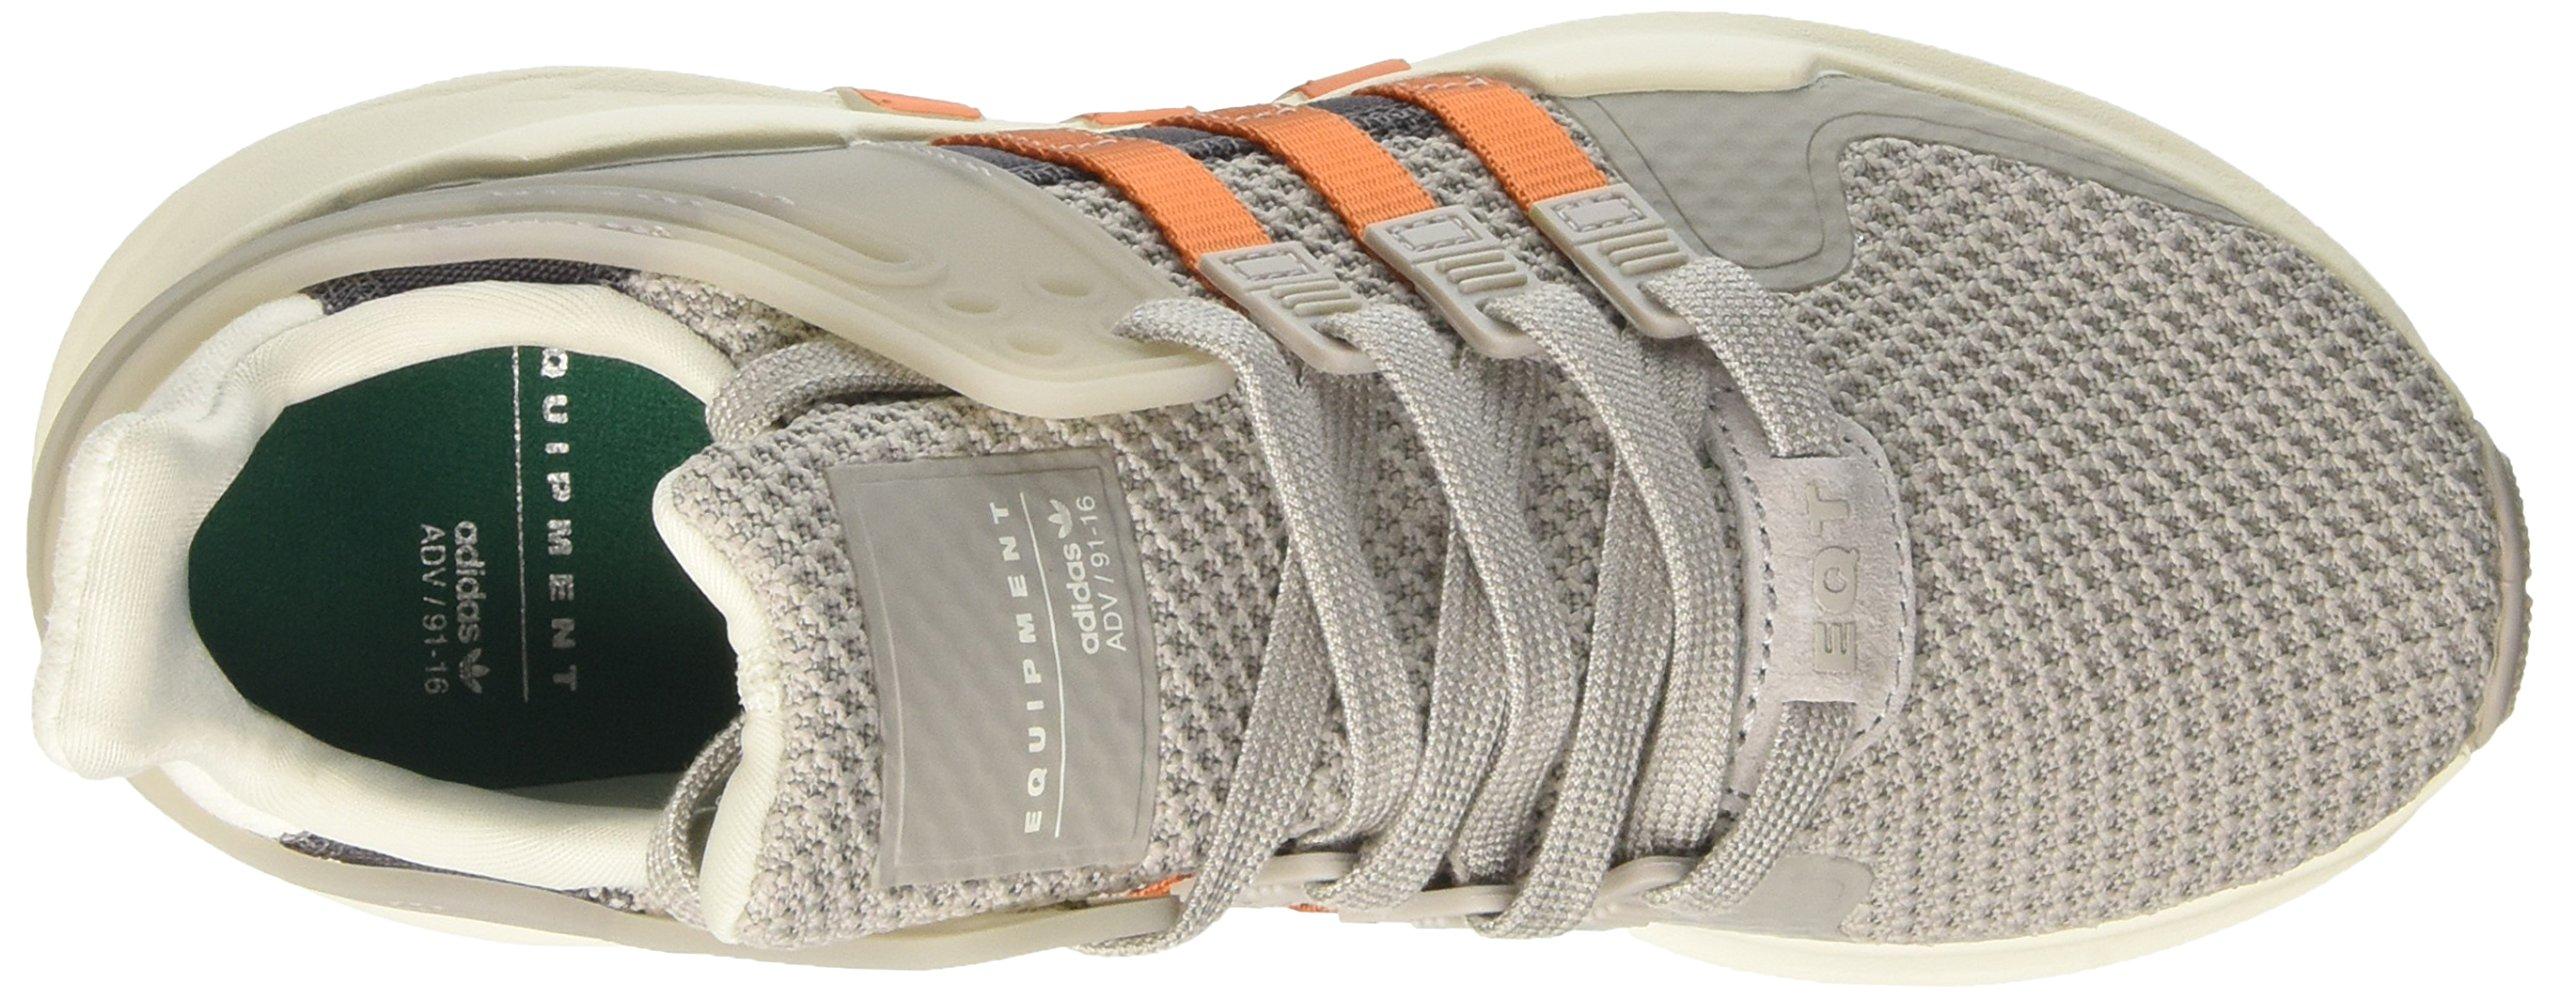 81IB1oZ3eEL - adidas Women's Equipment Support a Low-Top Sneakers, Grey